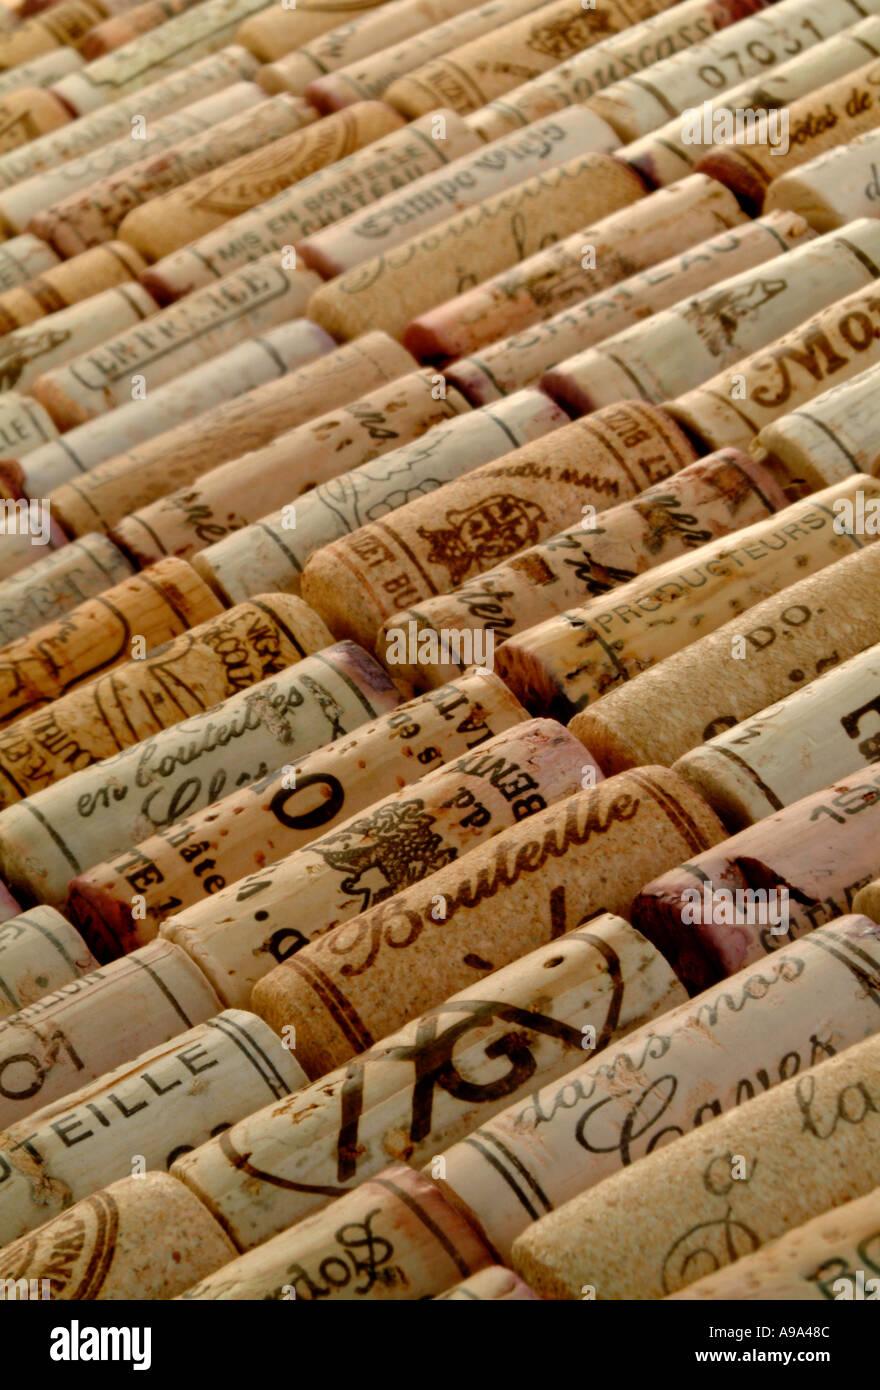 Bouchons de vin rouge Photo Stock